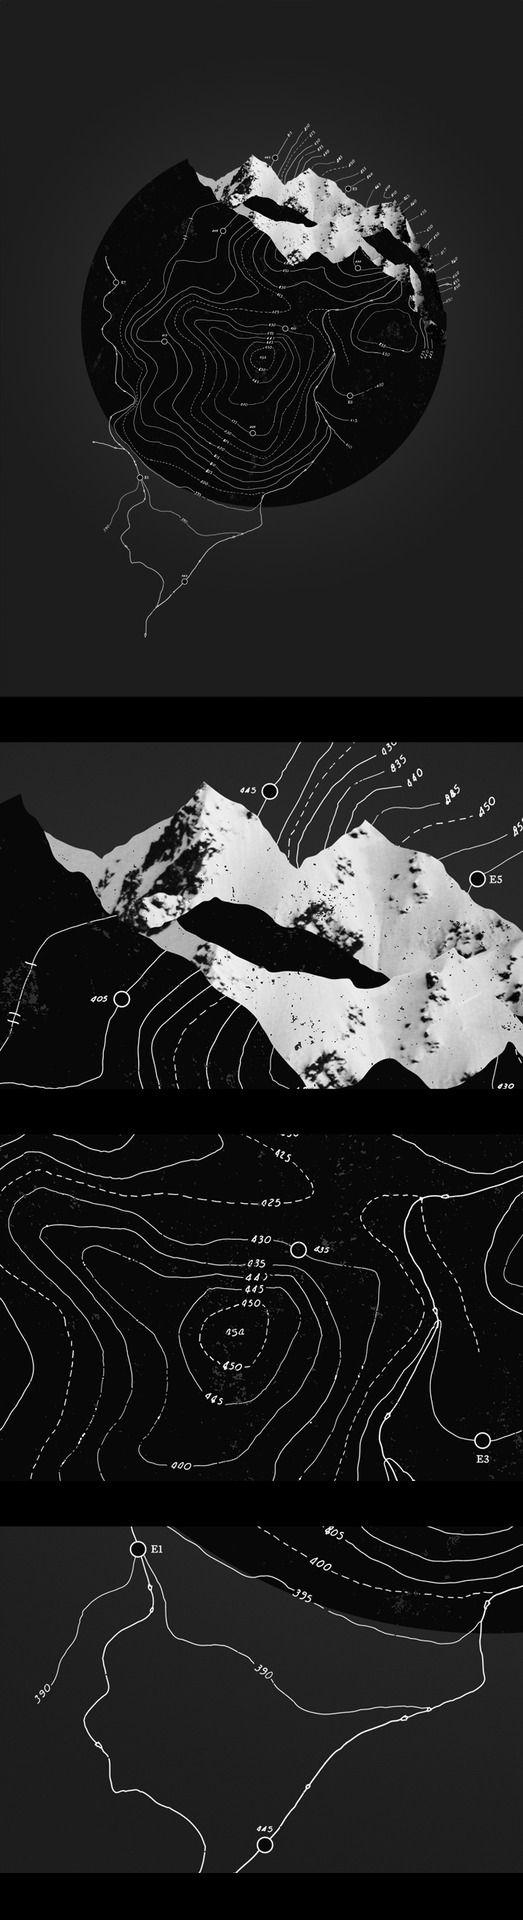 Mix of flat   3d. Topgrafo. Land Surveyor. Repin: Topografa BGO Navarro - Estudio de Ingeniera